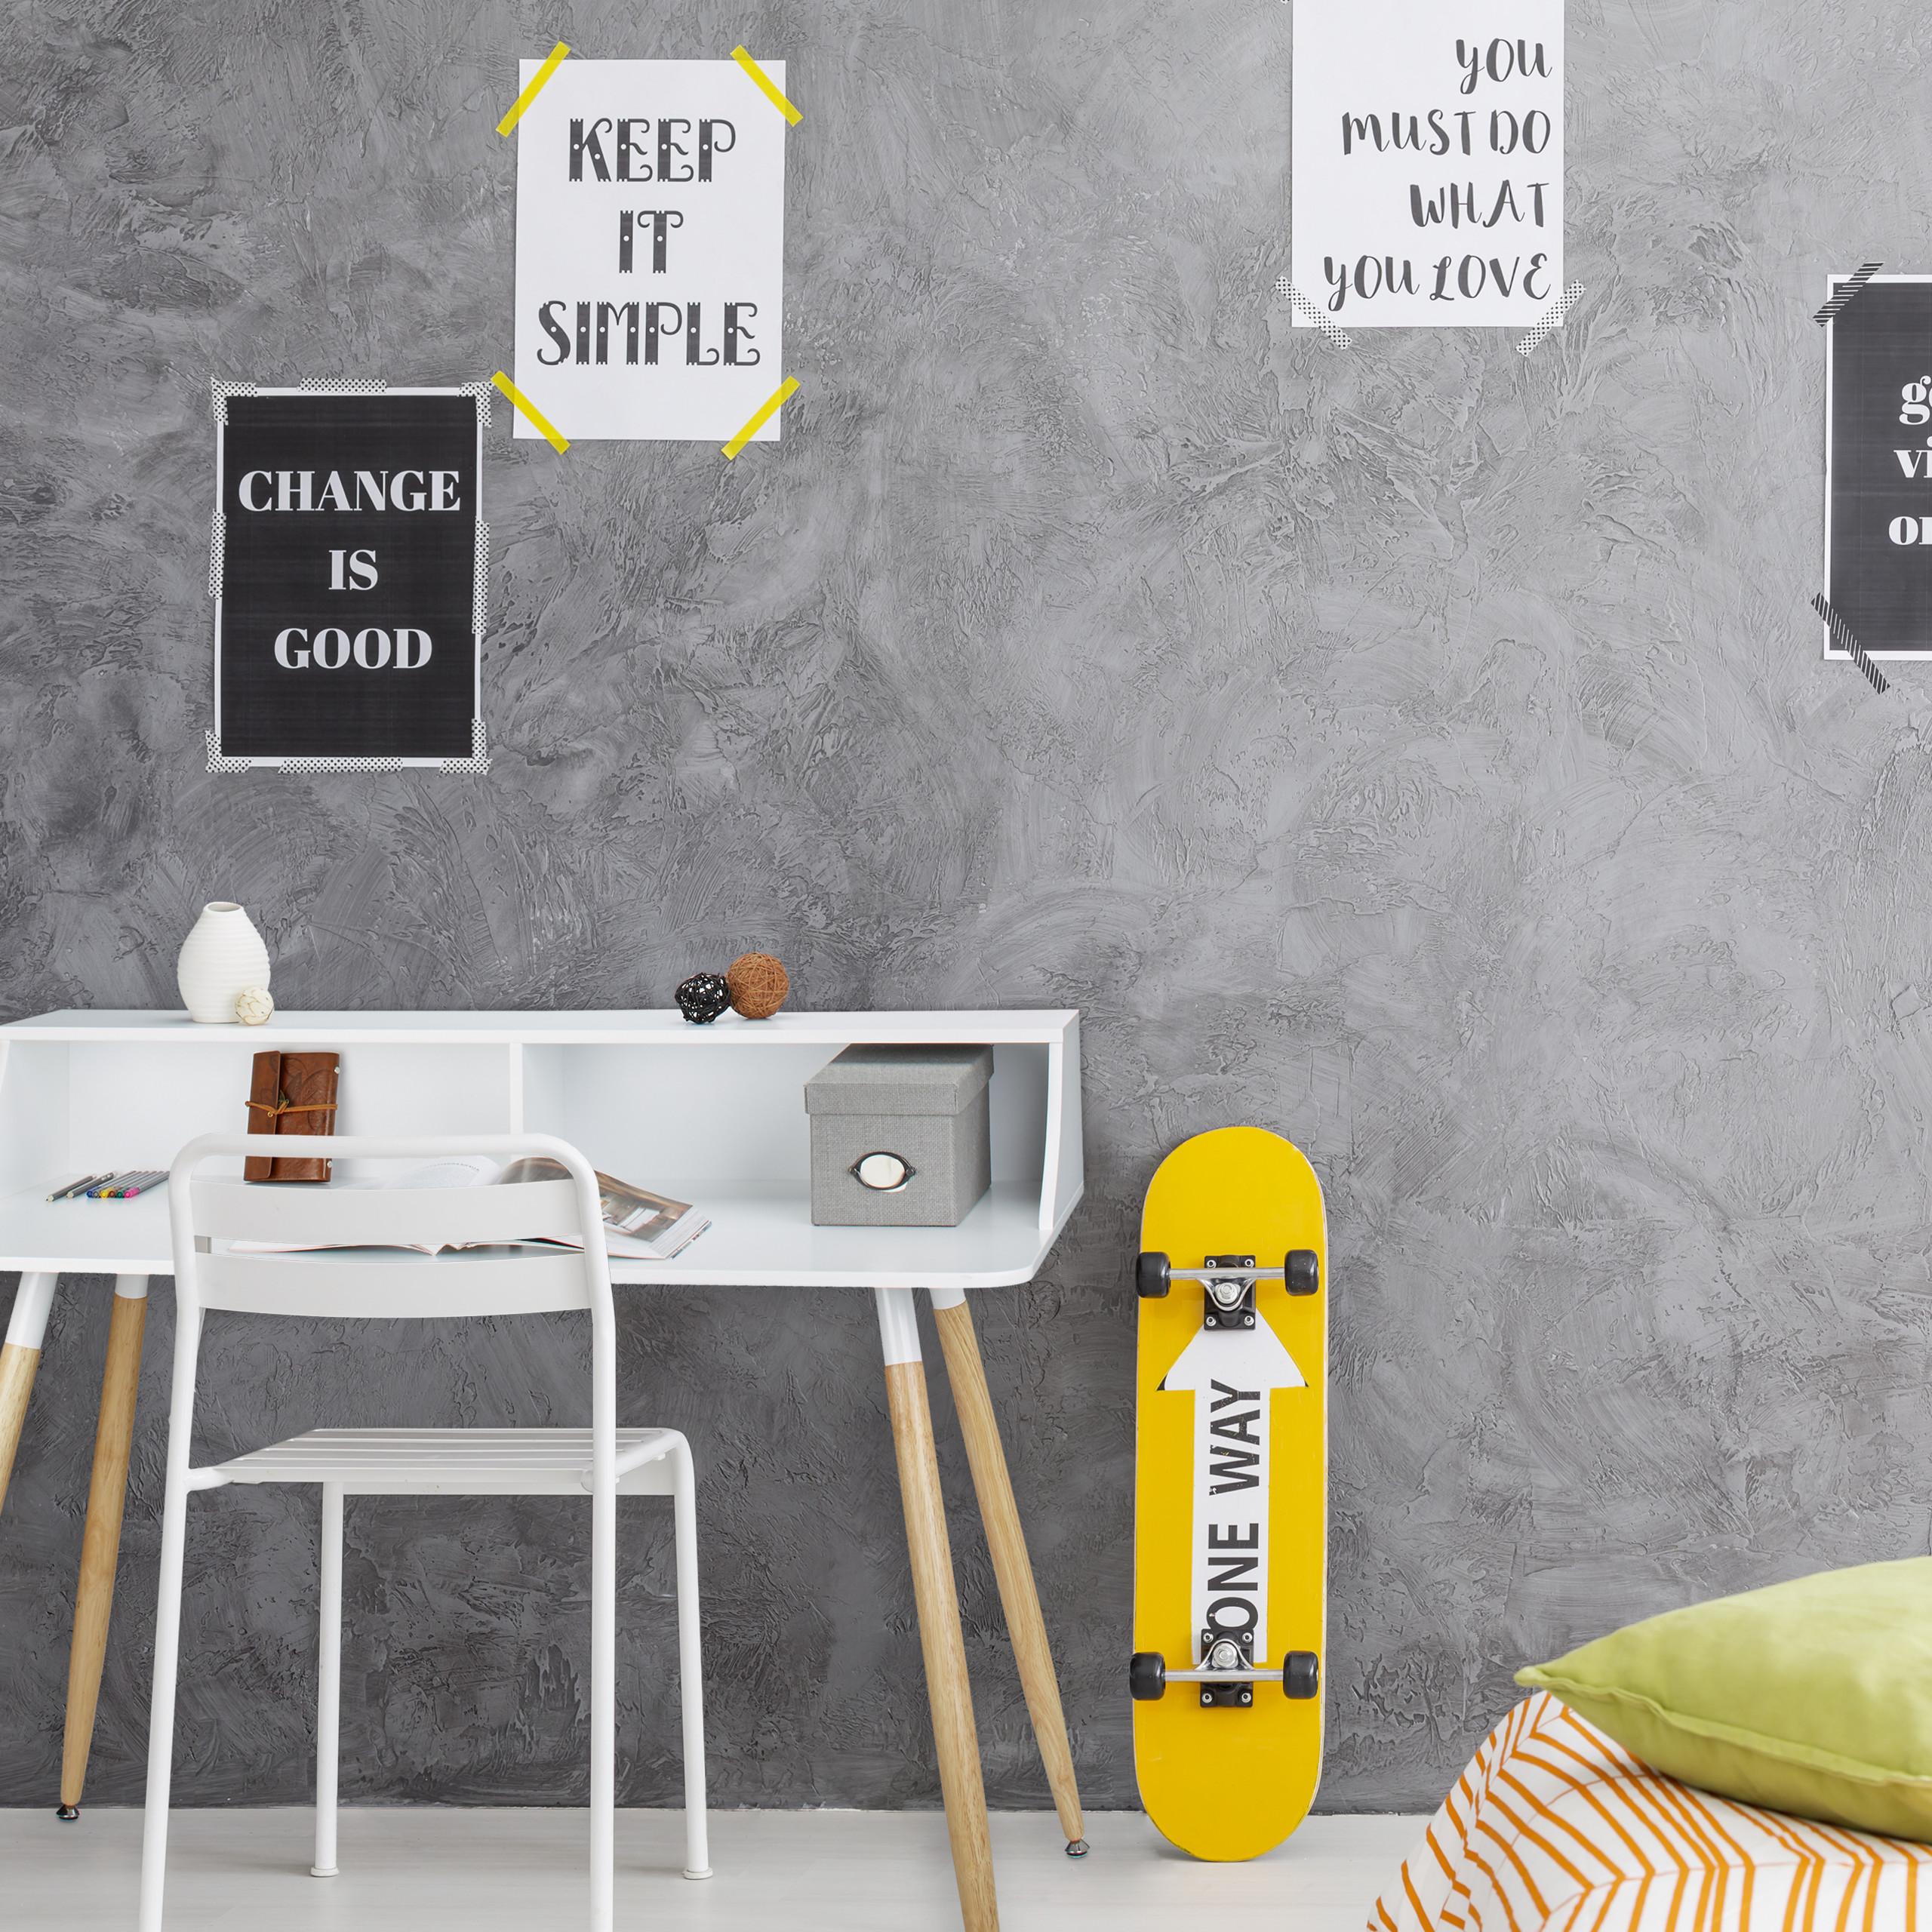 bureau-kinderbureau-ruimtebesparend-75-cm-hoog-laptoptafel-120-breed miniatuur 7